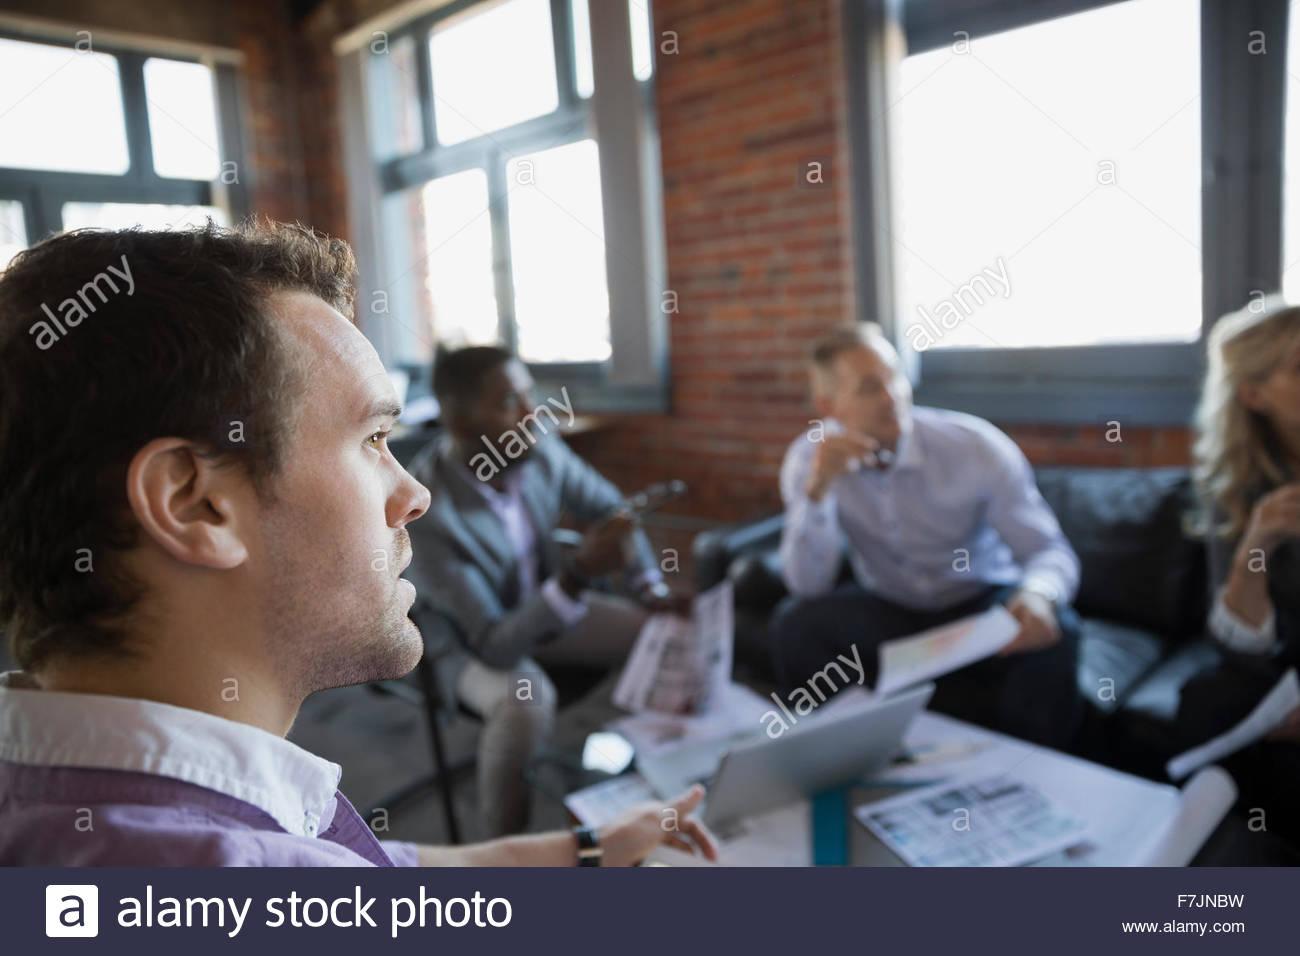 Business people looking away in meeting - Stock Image